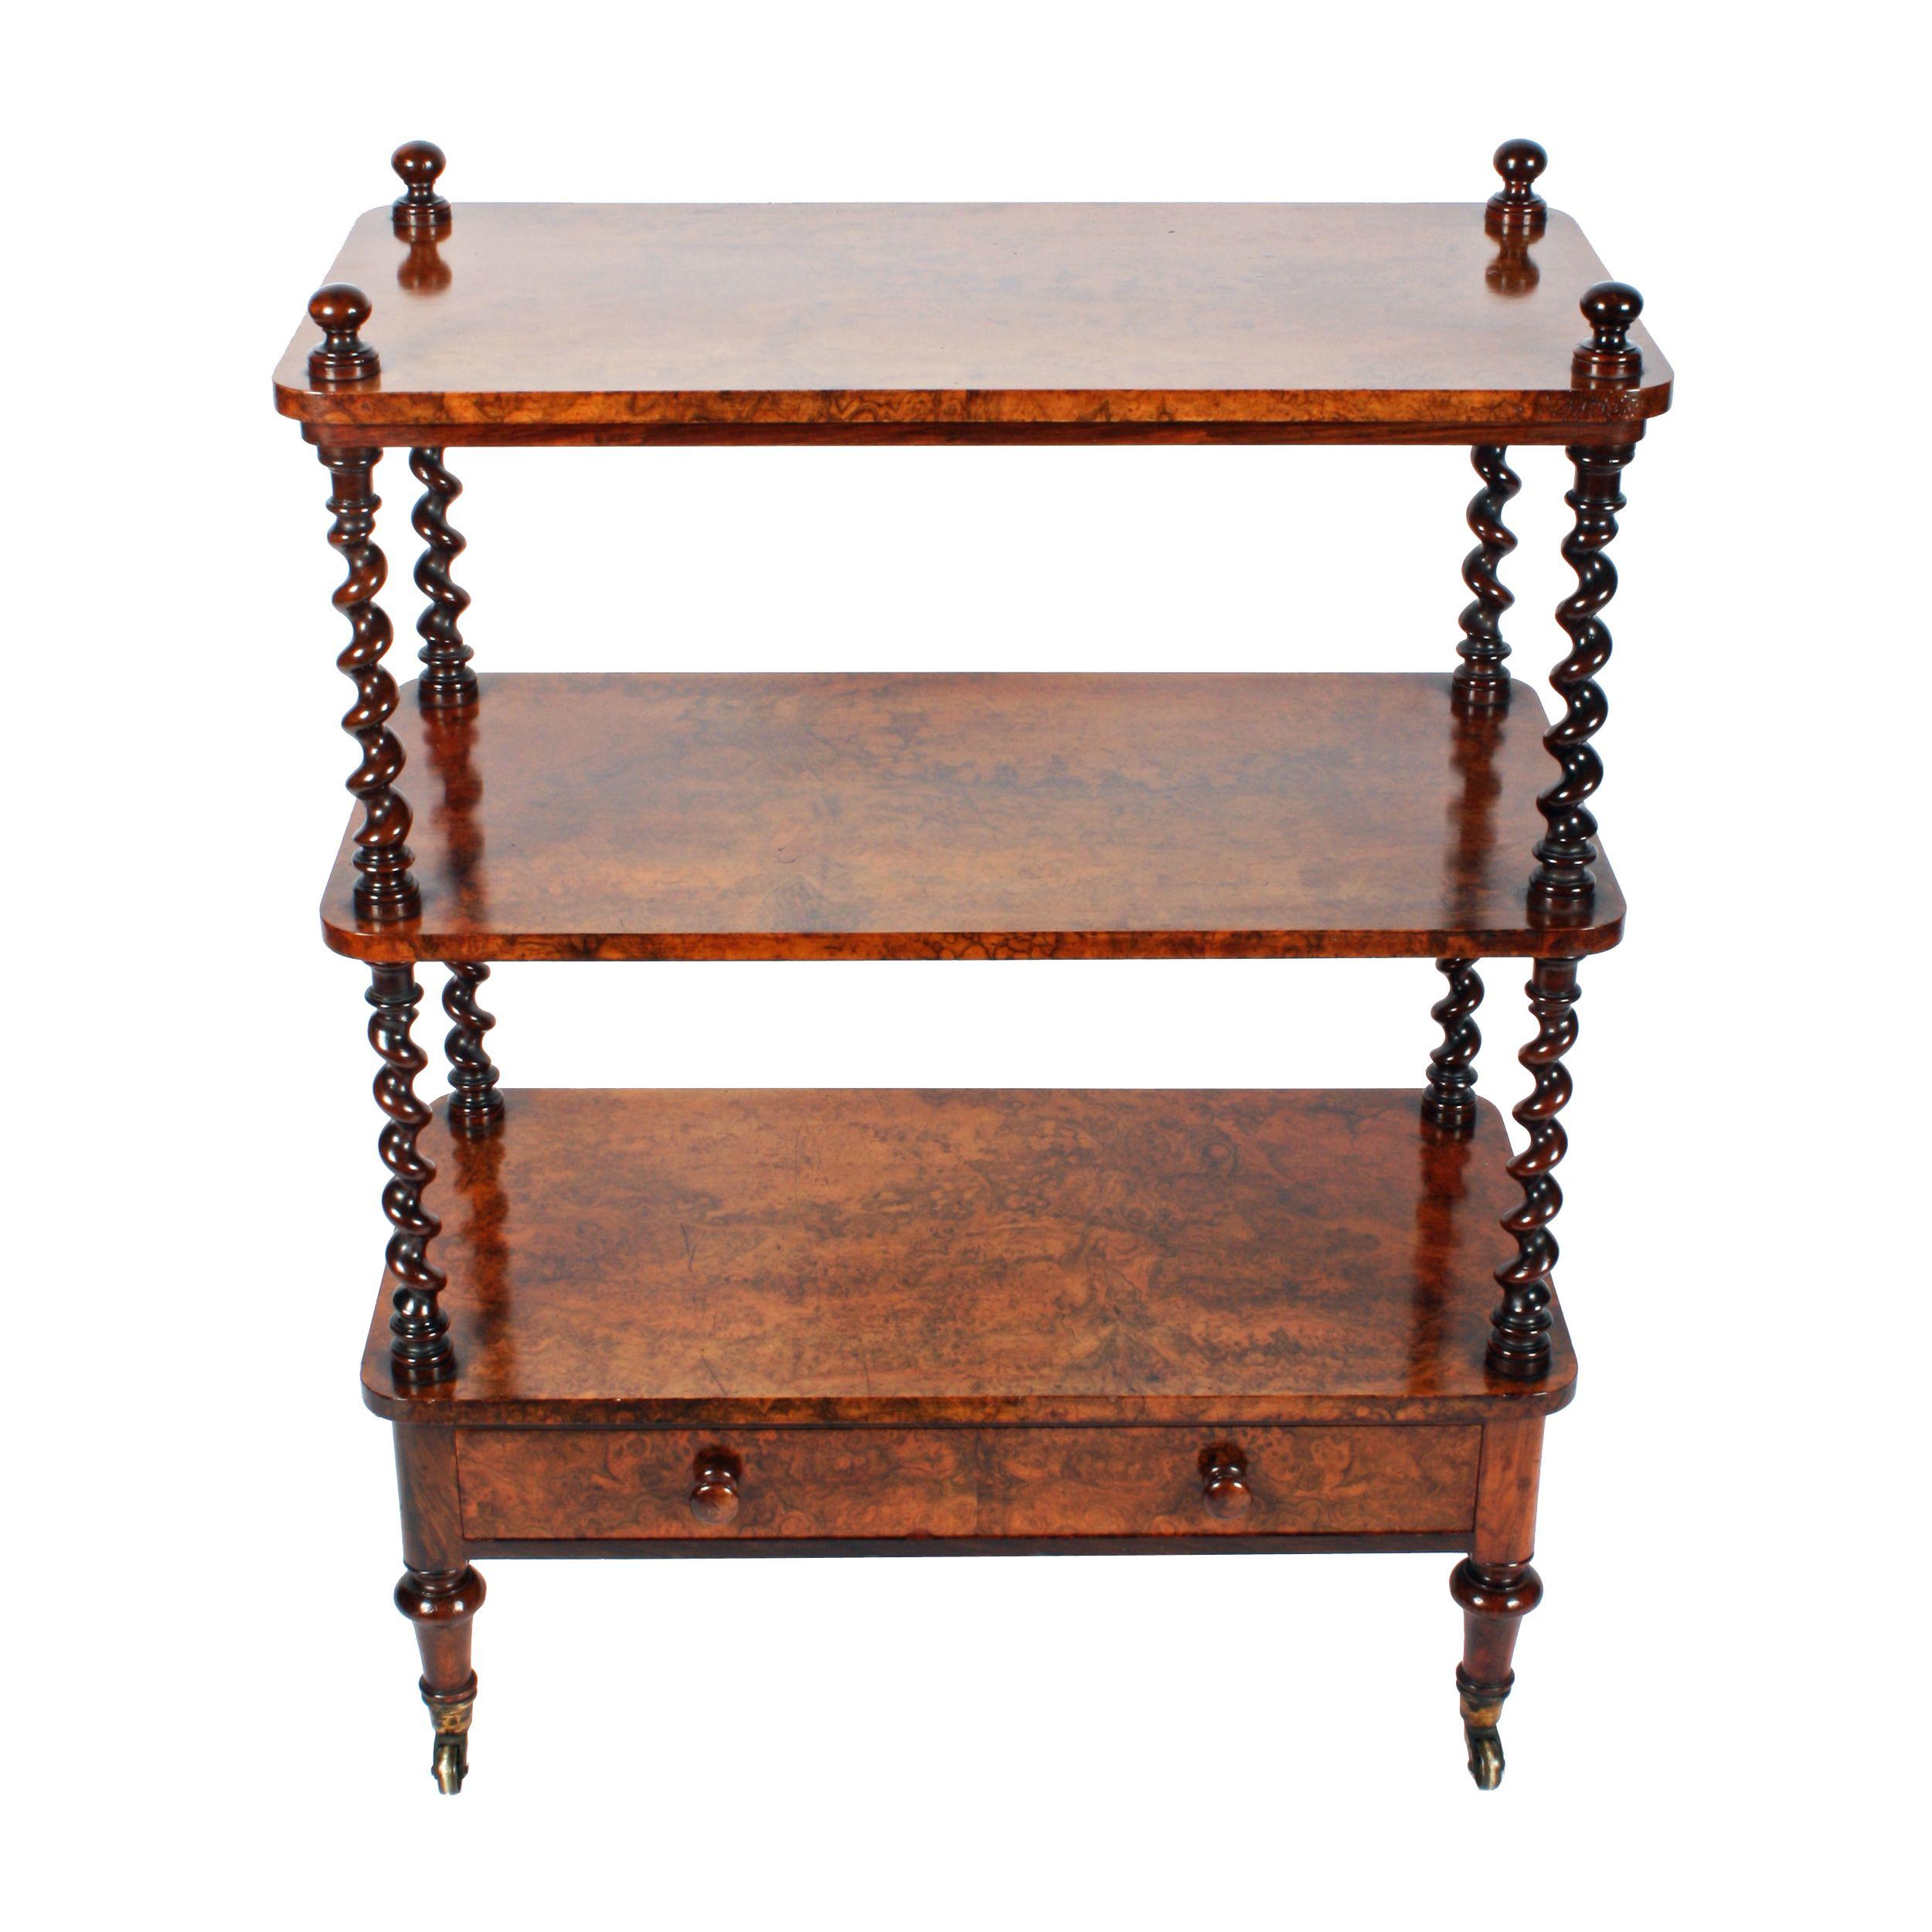 Furniture · Victorian Burr Walnut Whatnot